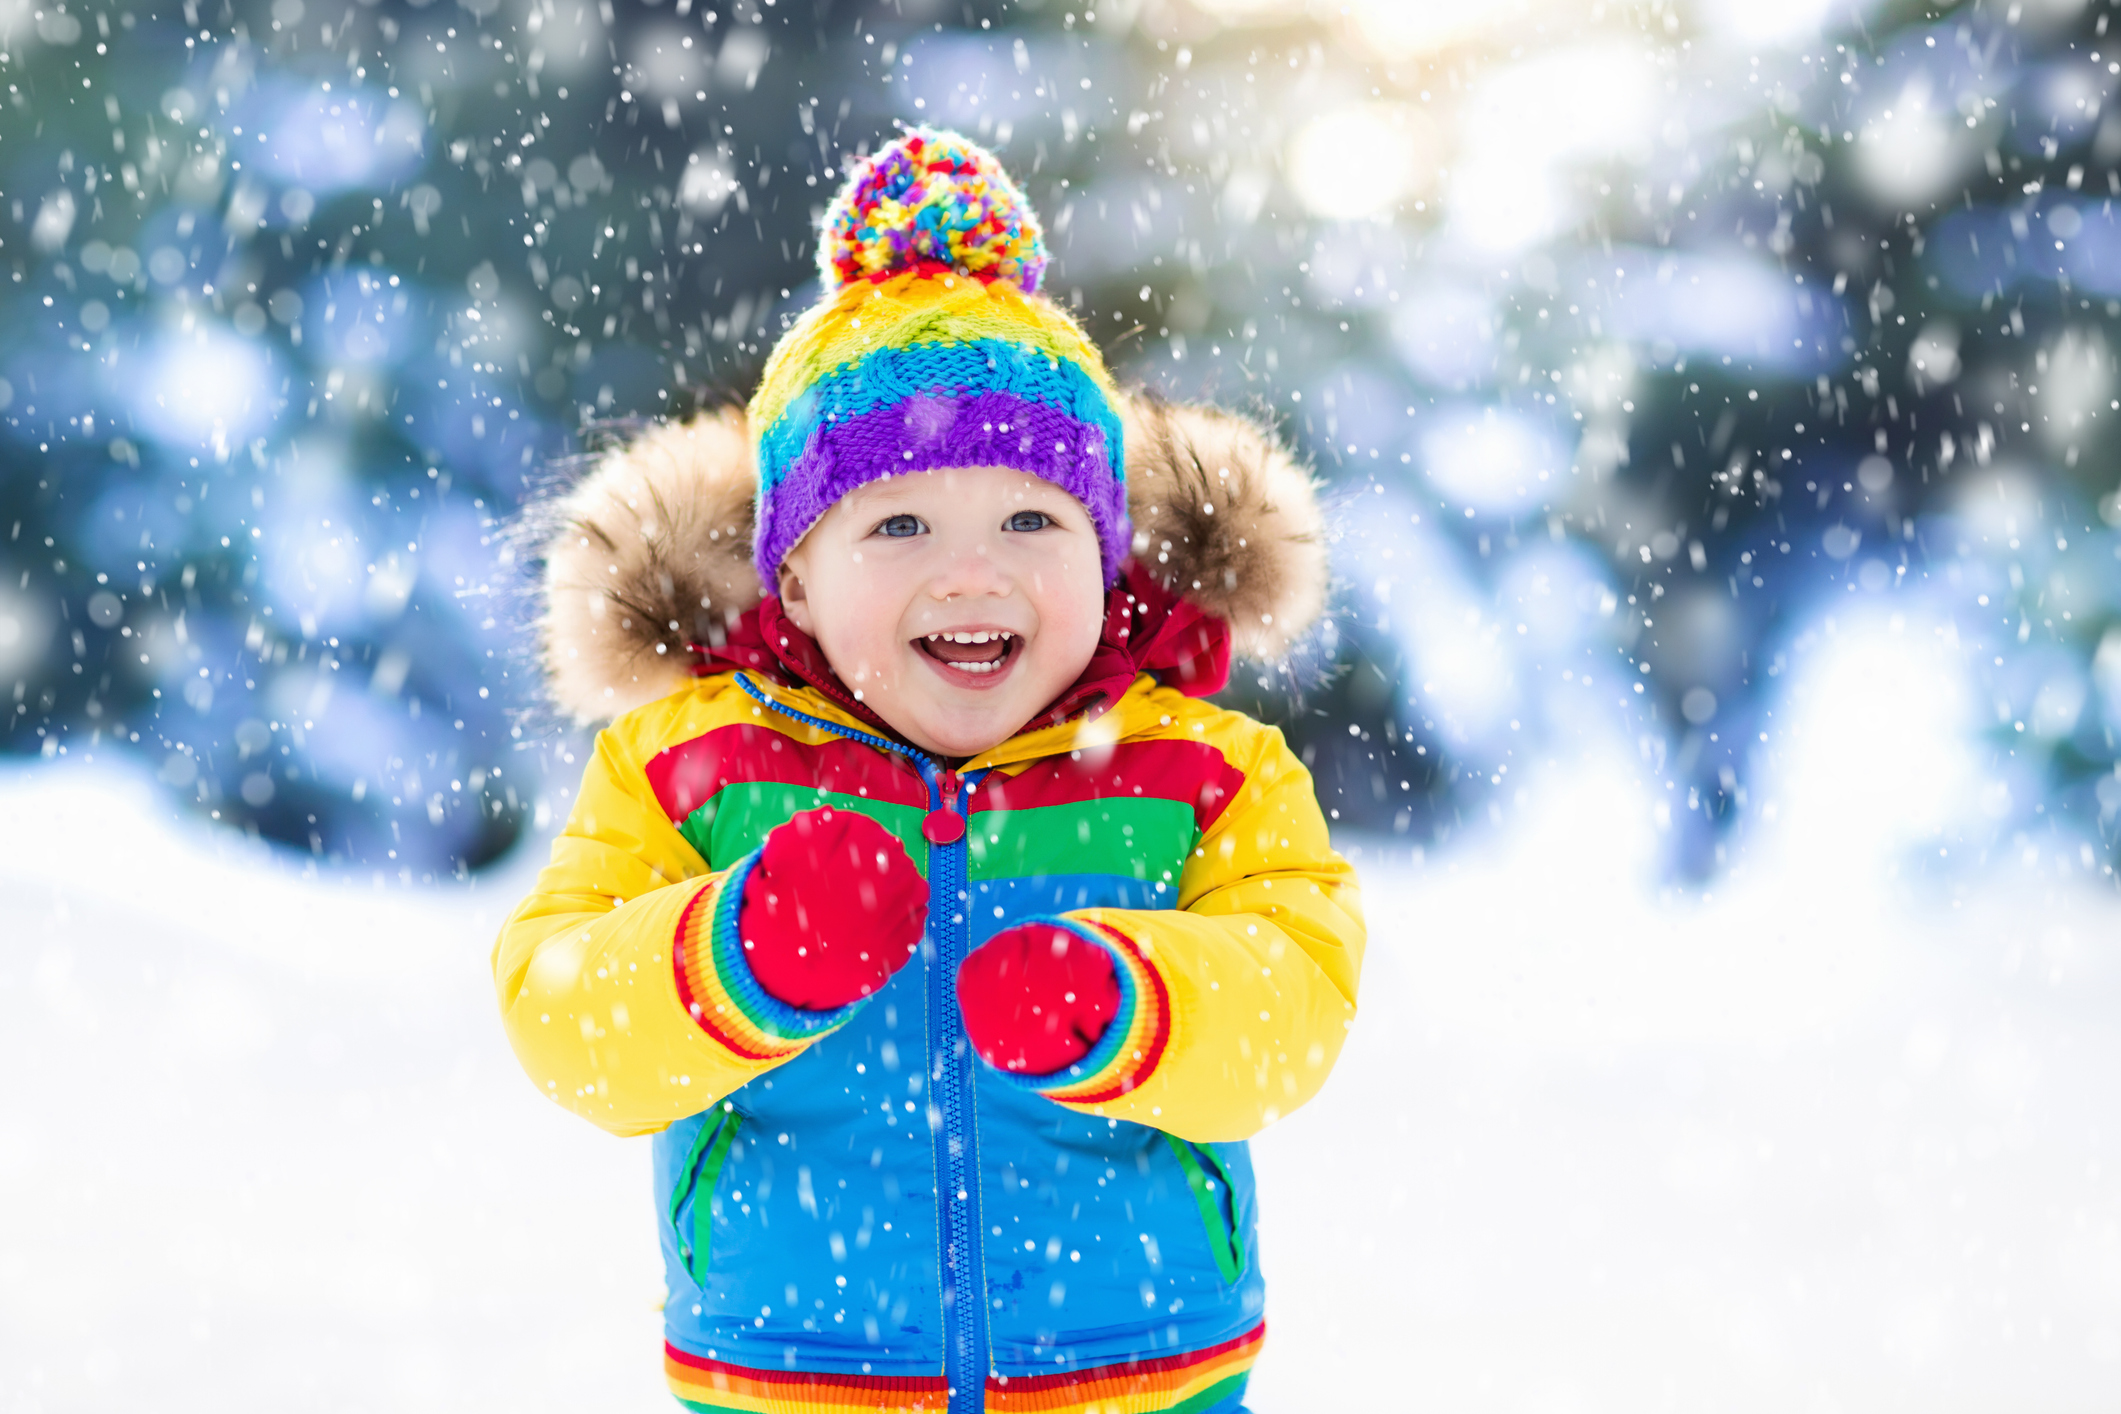 Chillax, Hotlanta! 4 Cool Spots for Frosty Fun